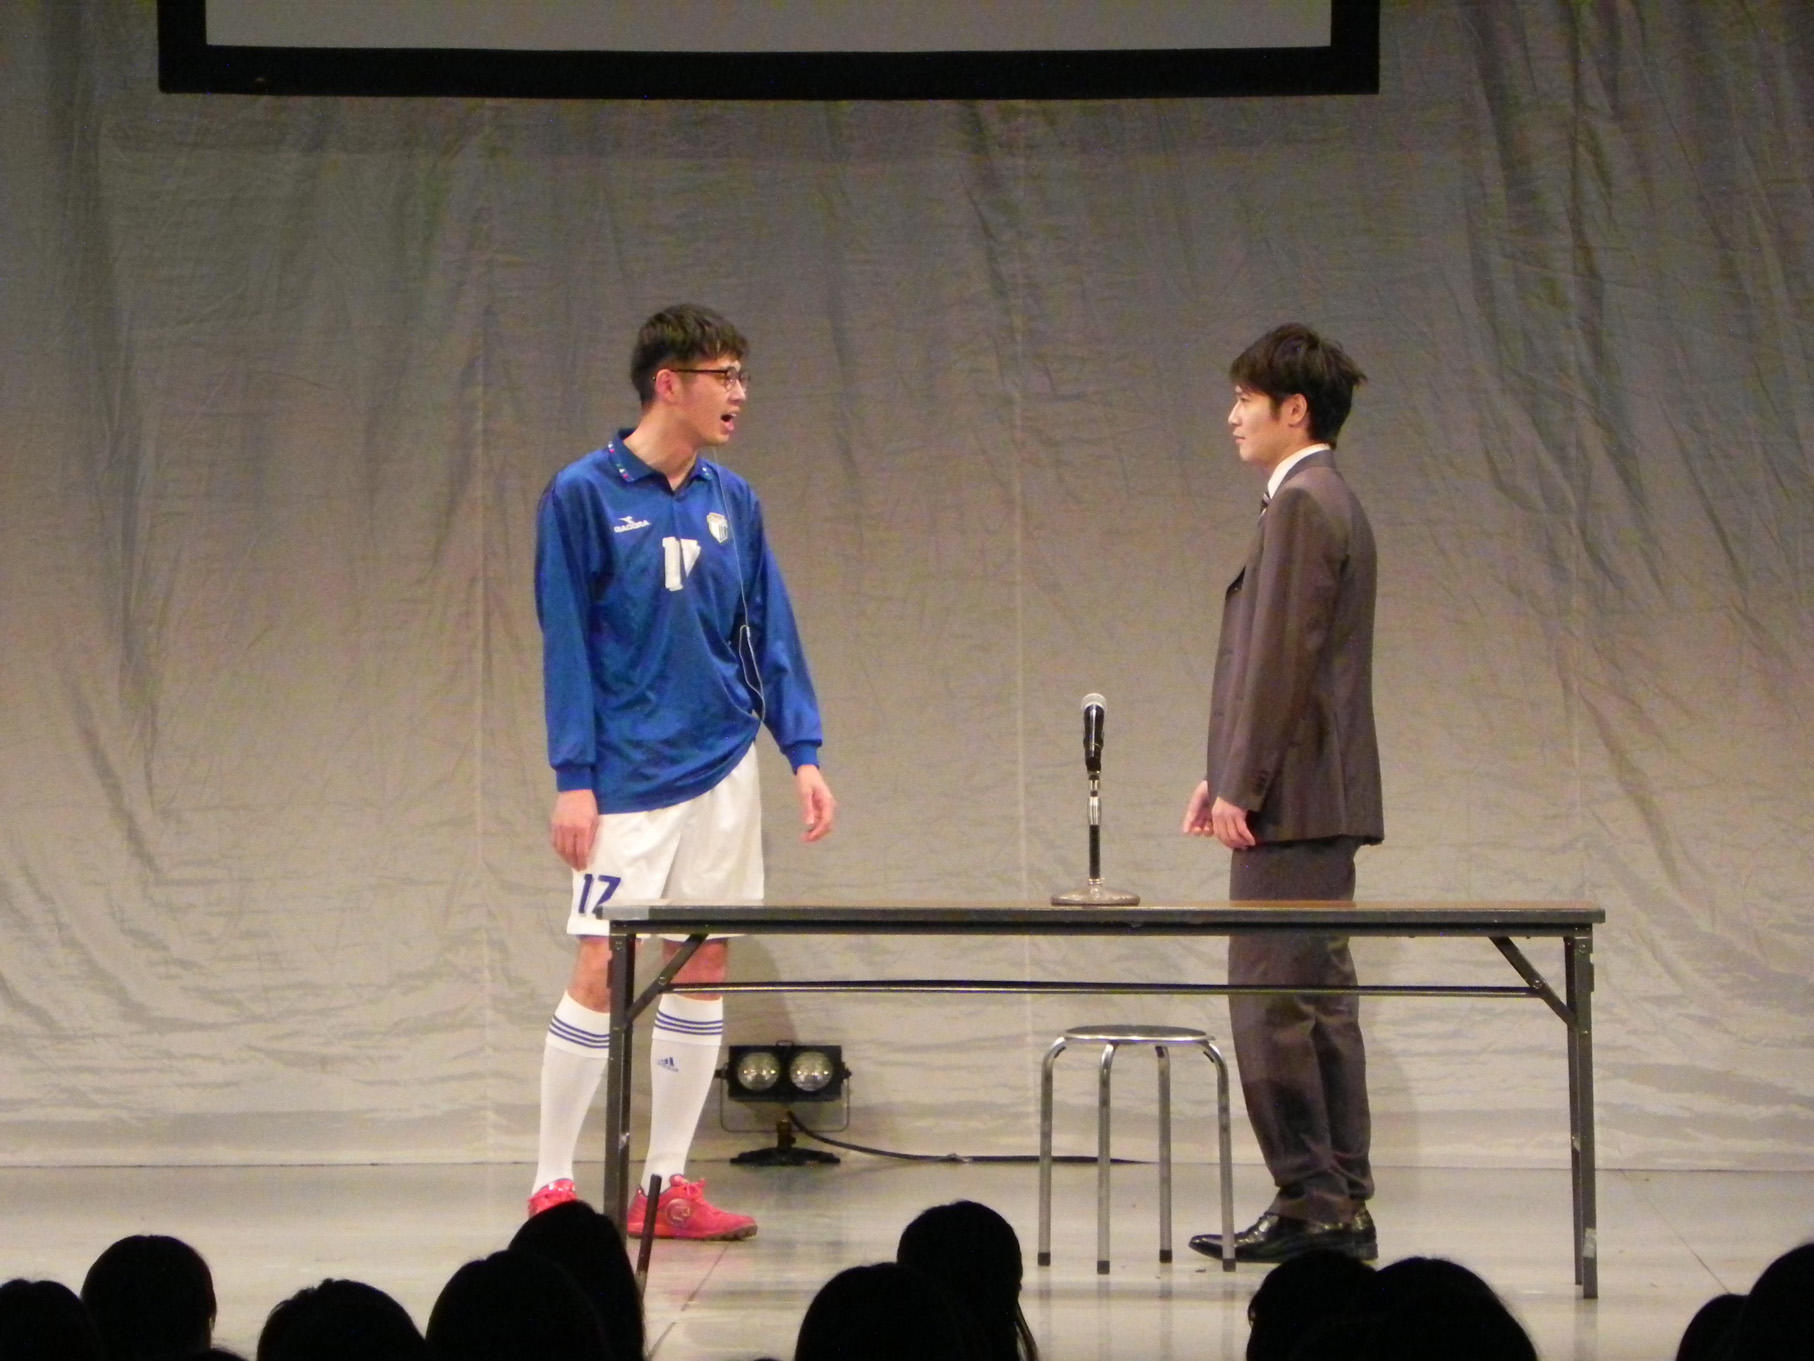 http://news.yoshimoto.co.jp/20170505220138-25e352ca94d3bb3b5337da406c2b41bd2deee5f6.jpg